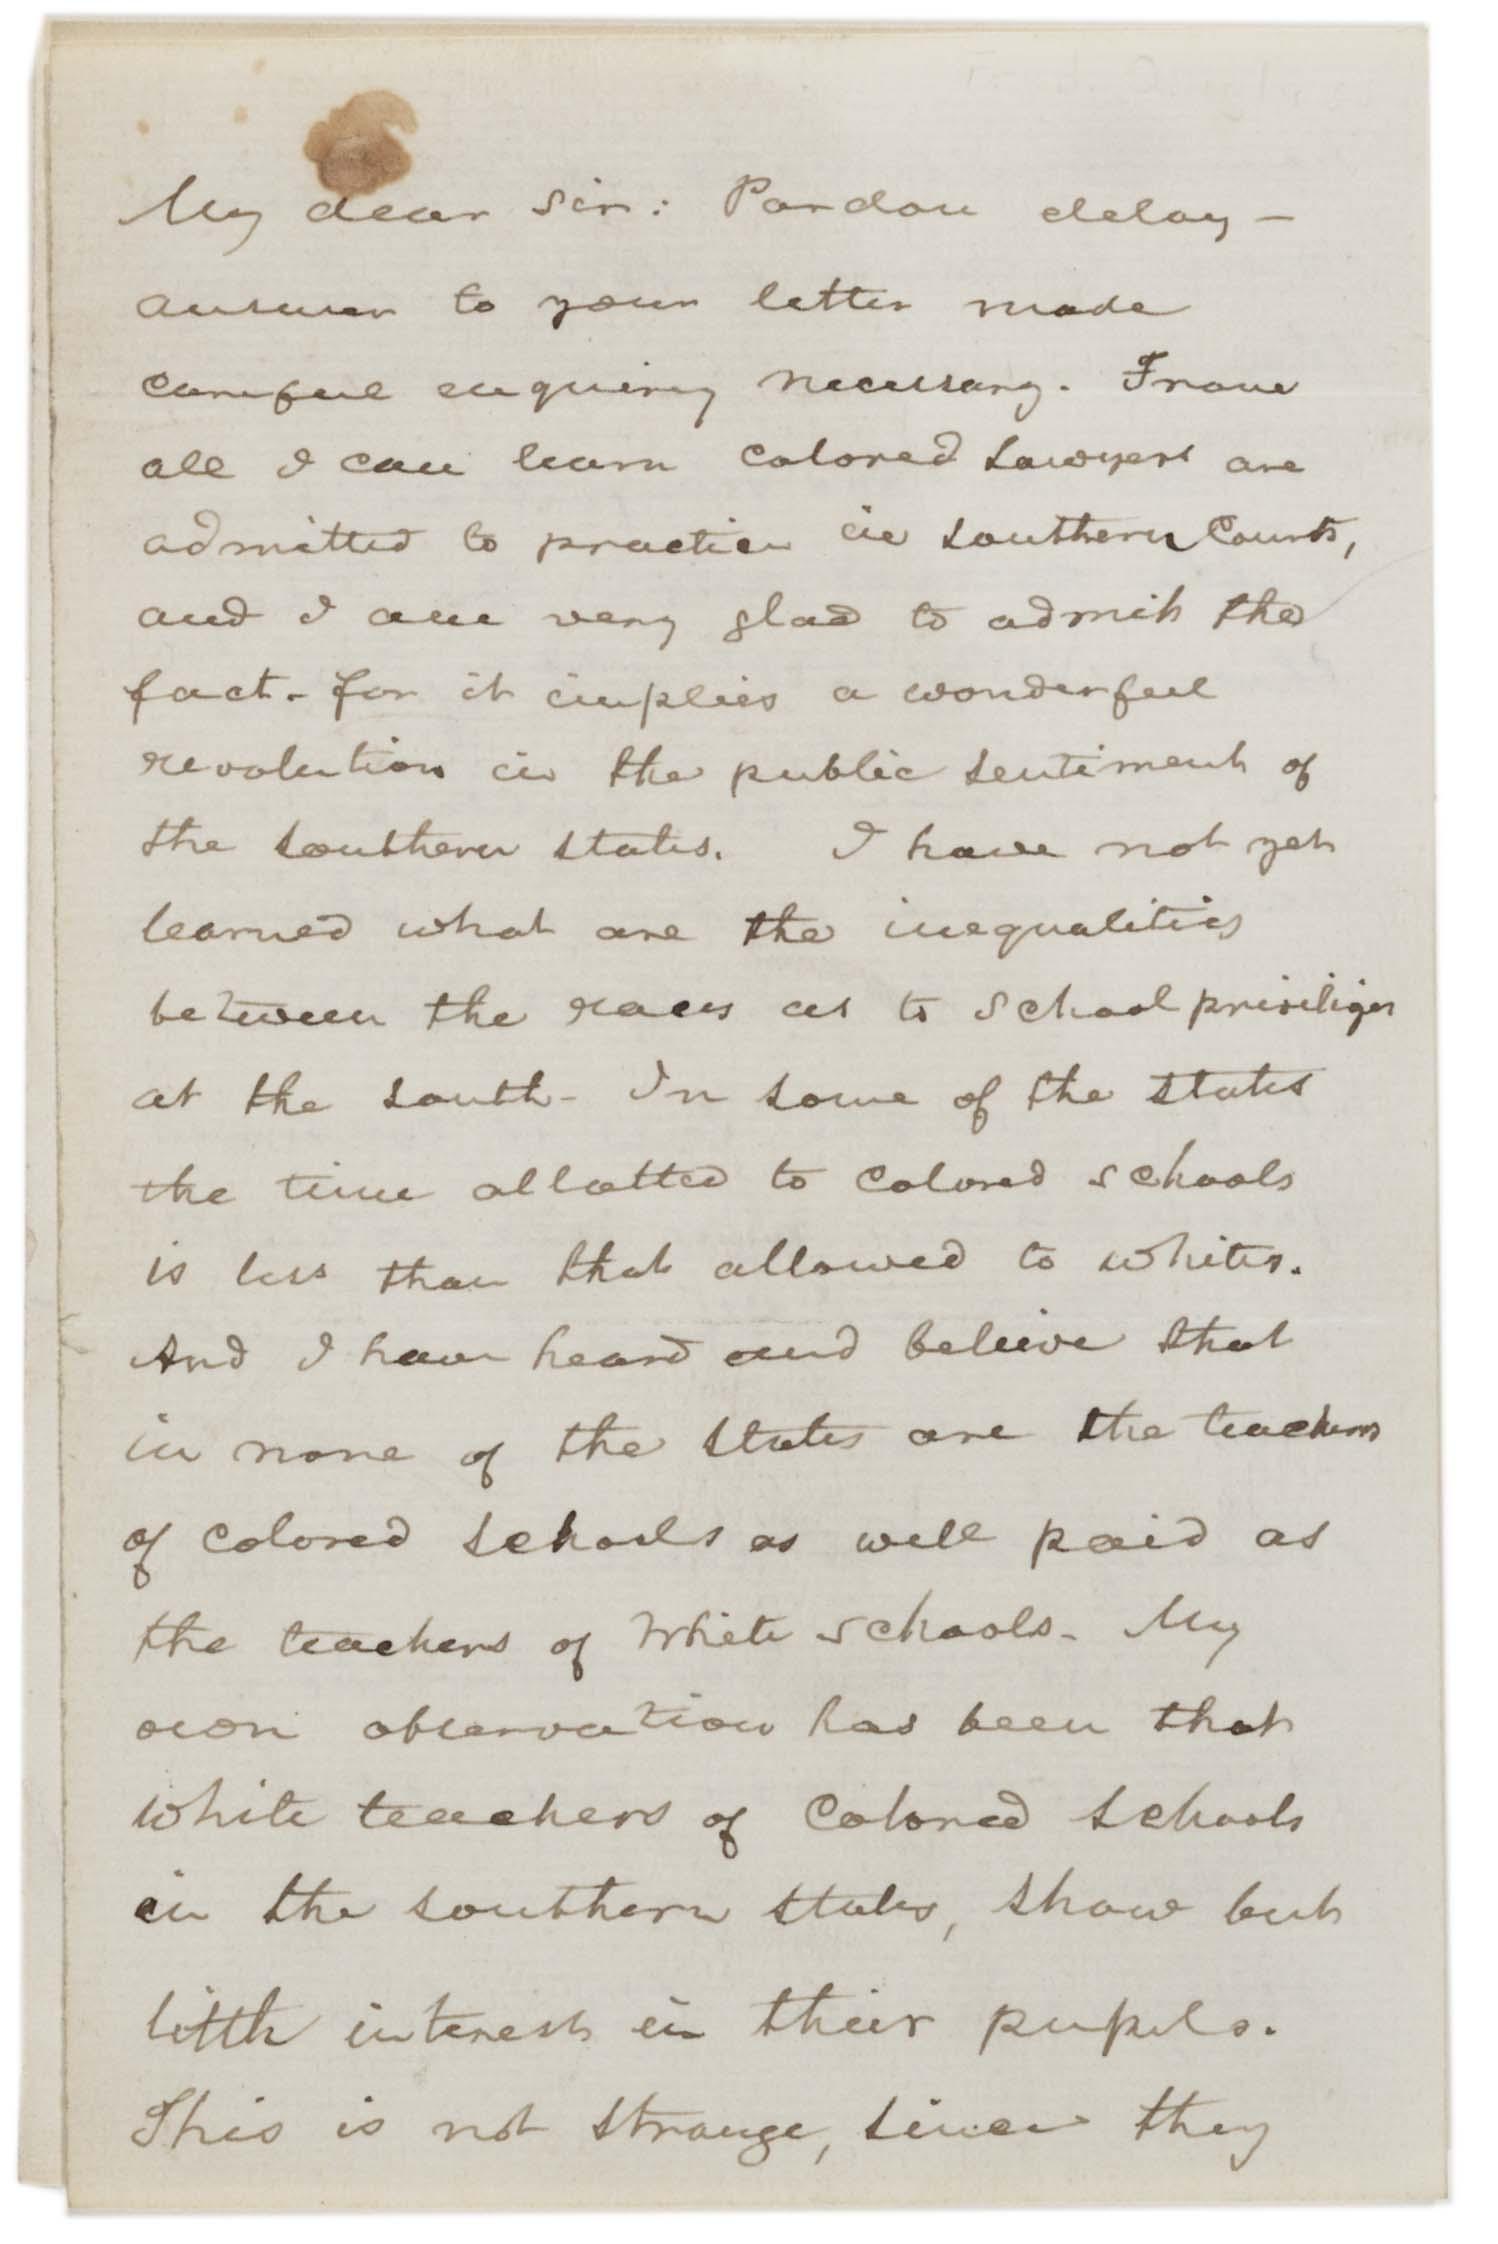 Frederick douglass on jim crow 1887